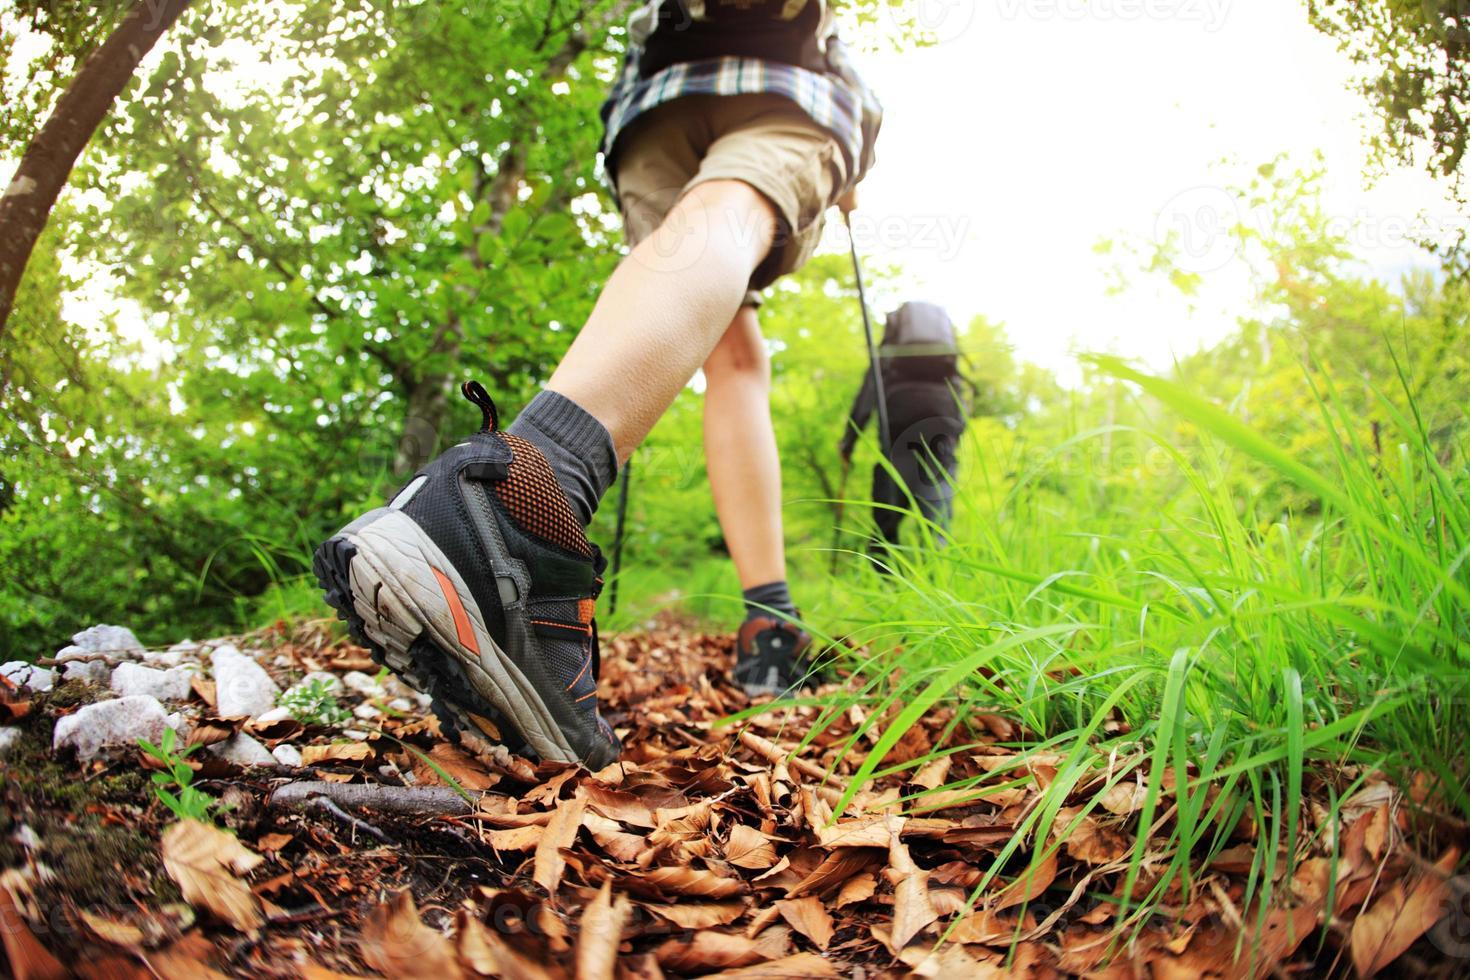 Nordic walking legs in mountains photo